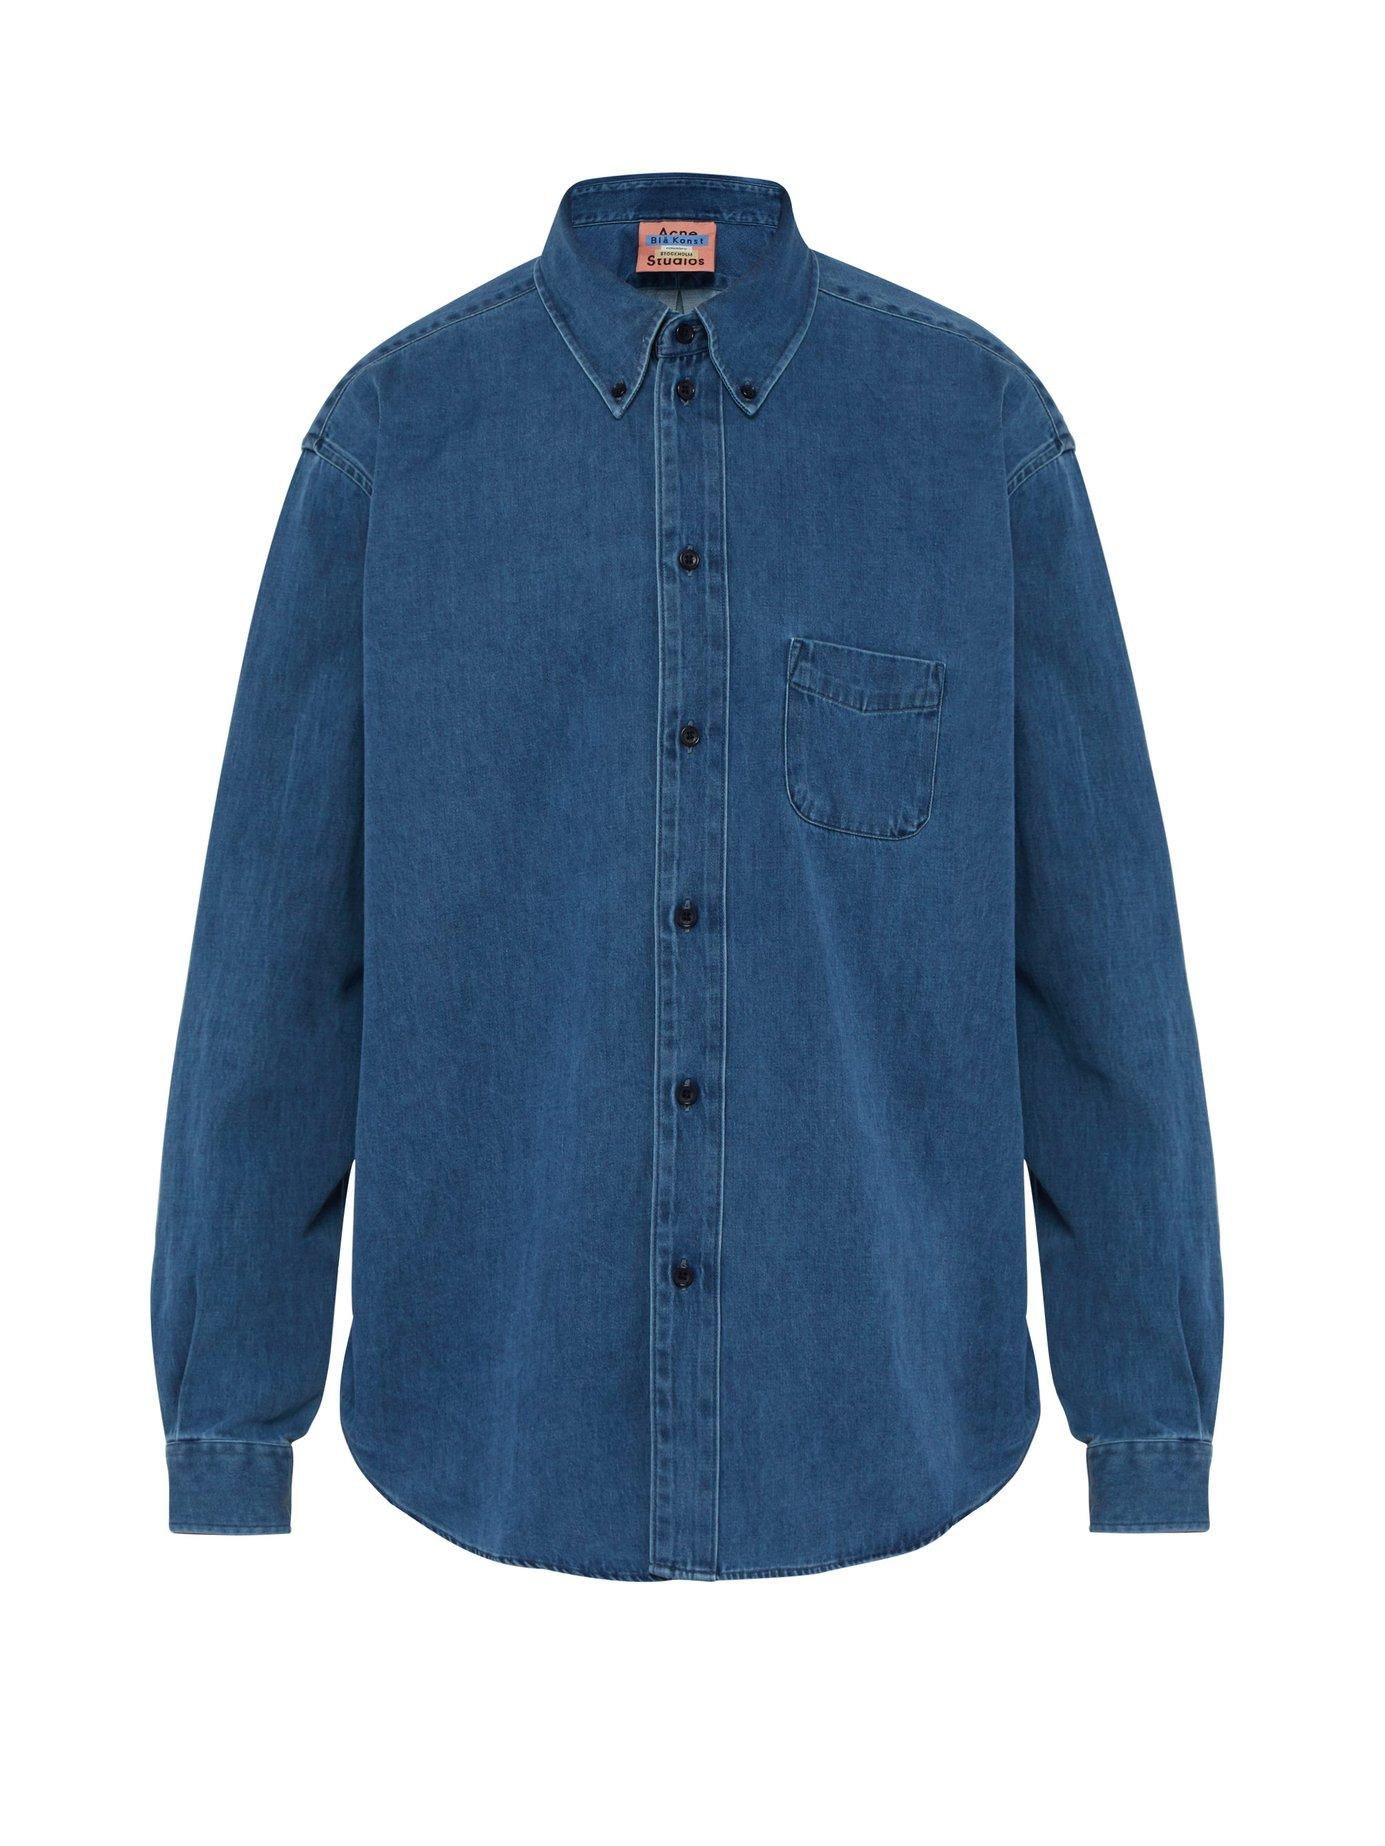 c559a46132 Lyst - Acne Studios Denim Shirt in Blue for Men